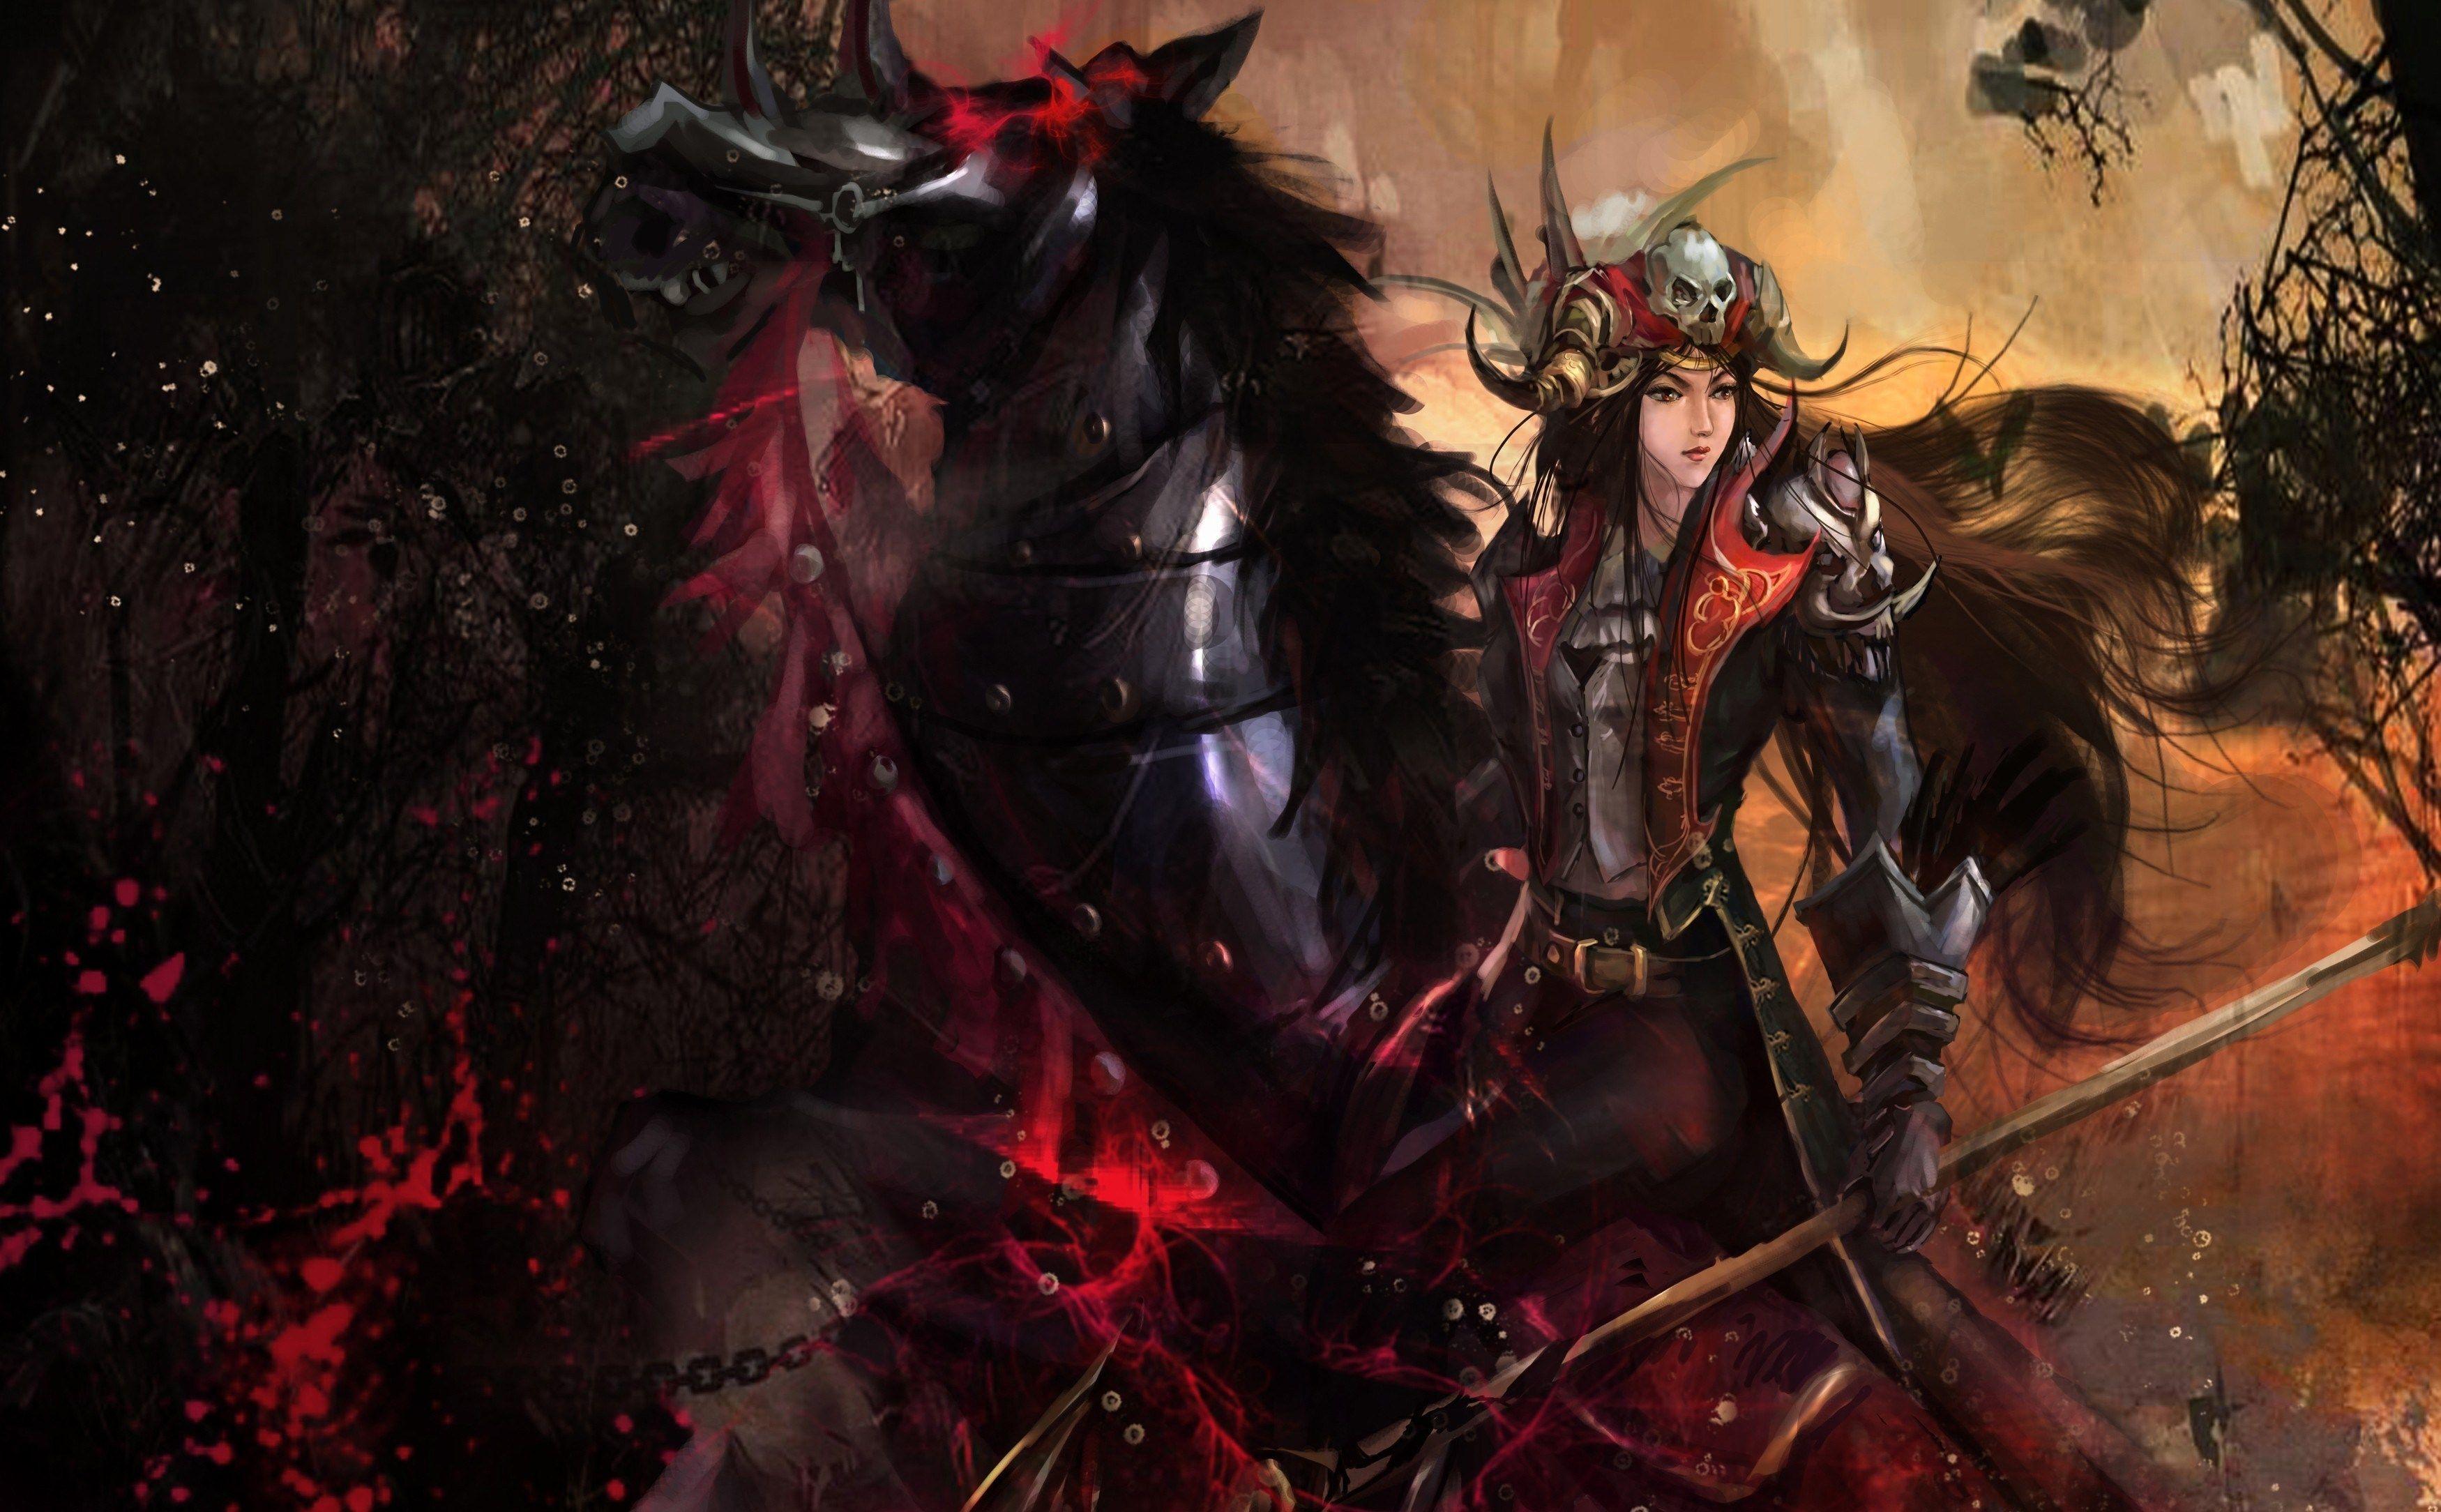 free download pictures of women warrior Warrior images